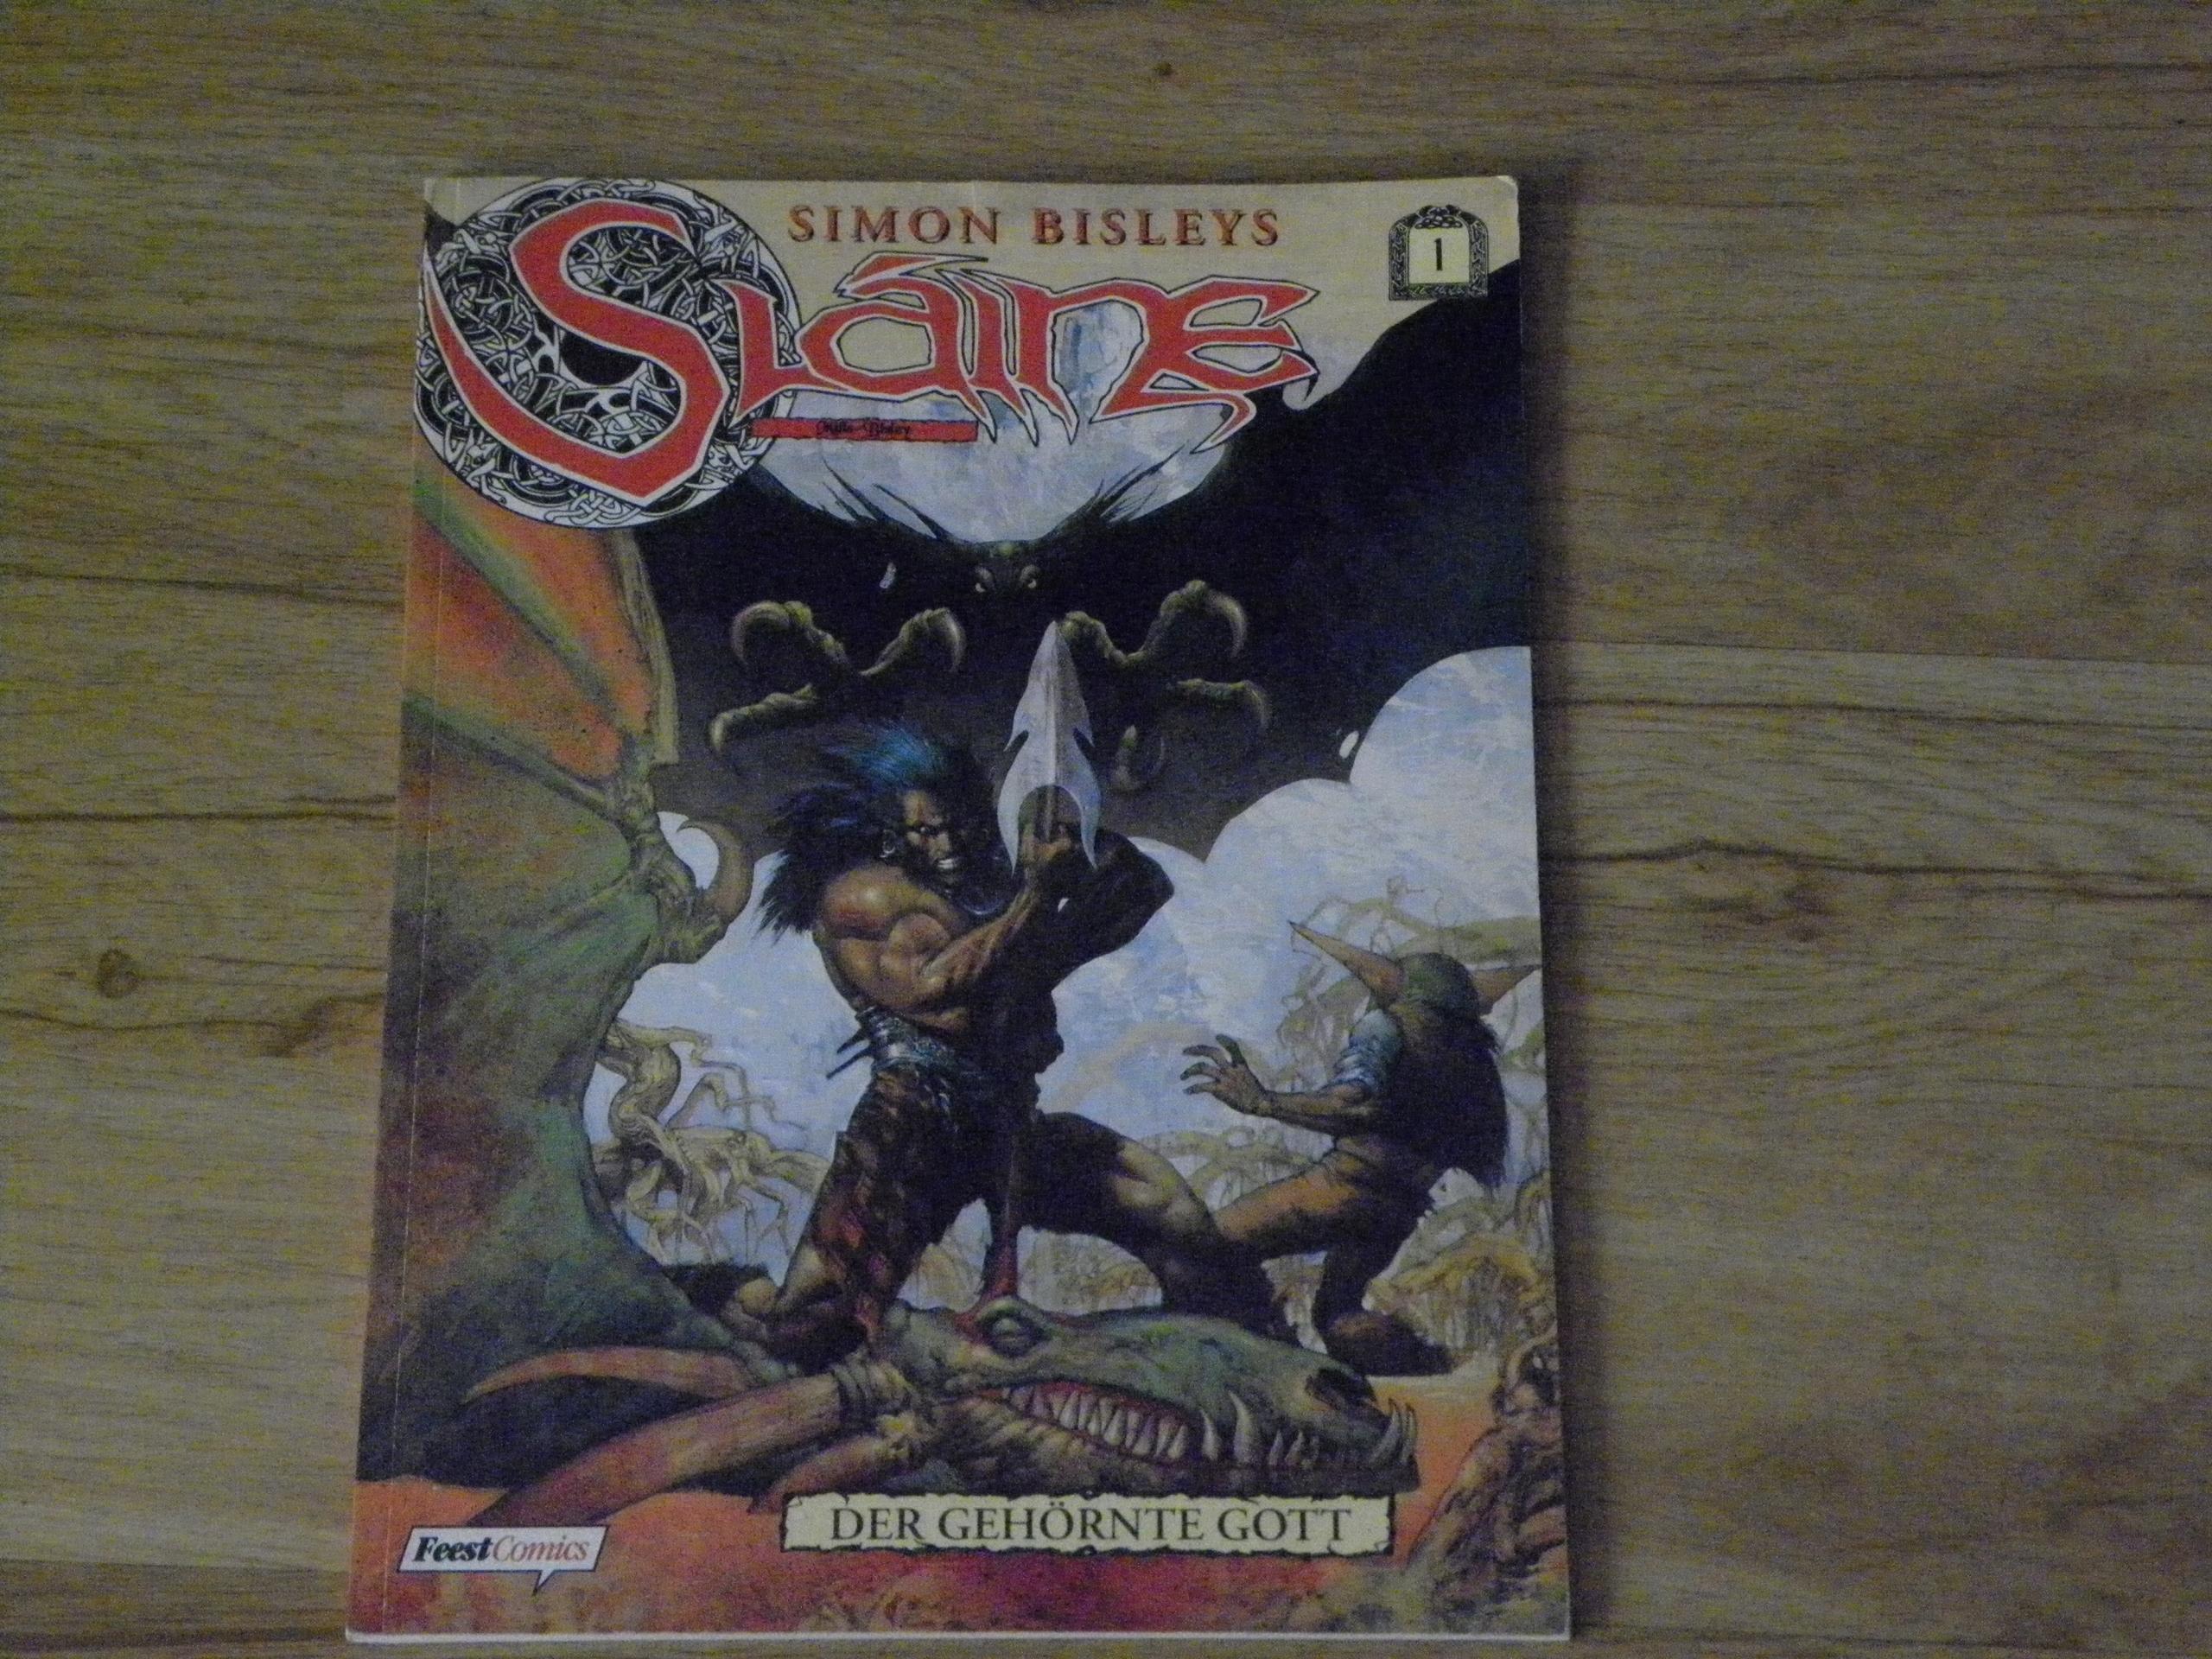 Slaine, S. Bisleys, 1996